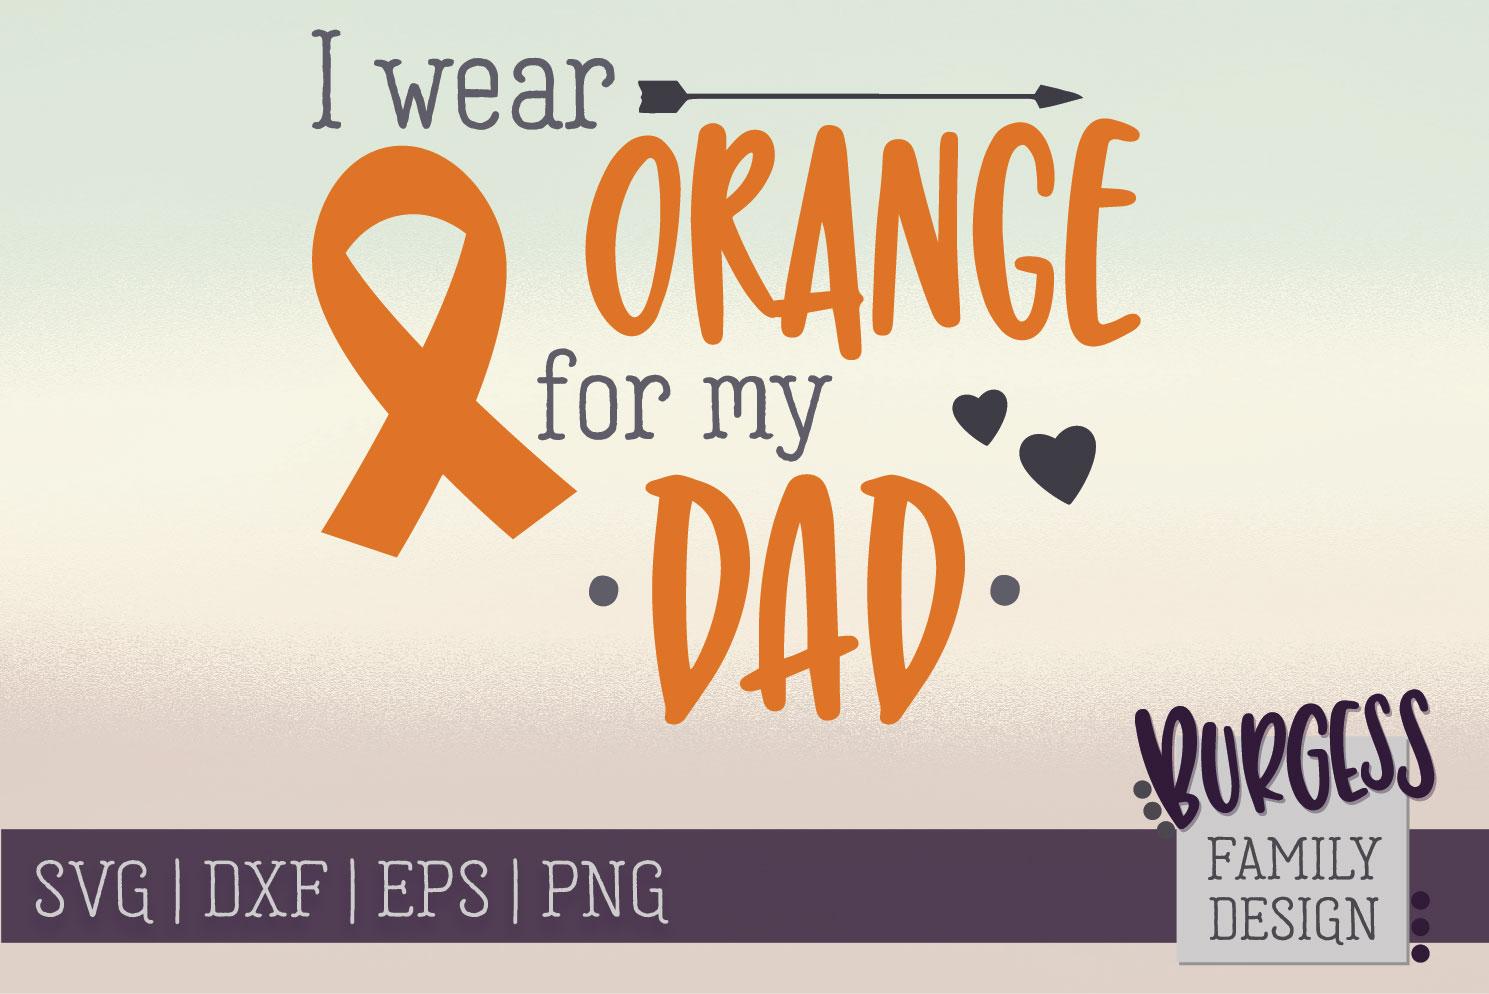 BUNDLE | I wear orange for my family | SVG DXF EPS PN example image 5